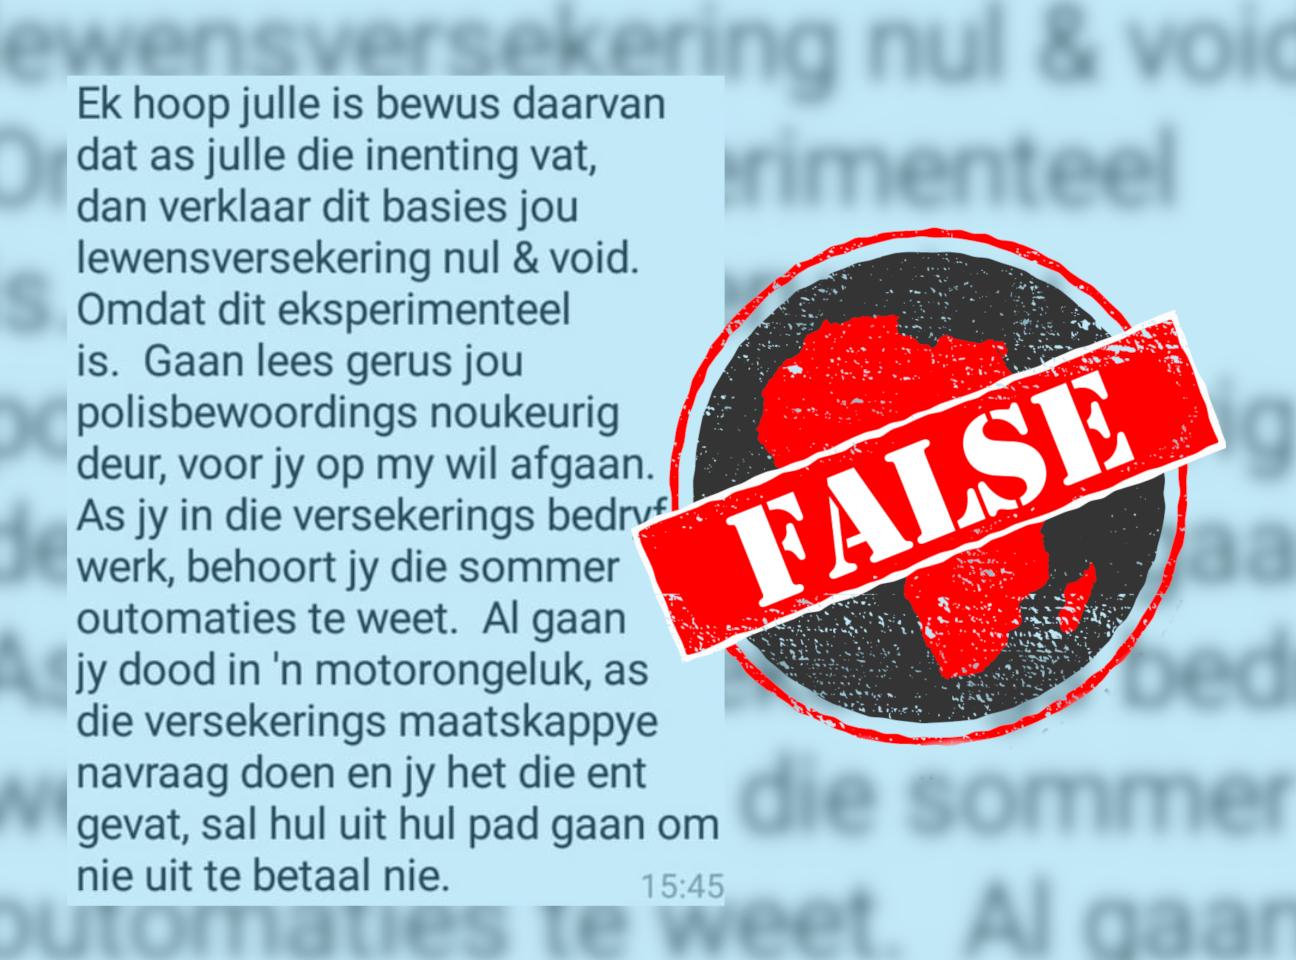 Insurance_False